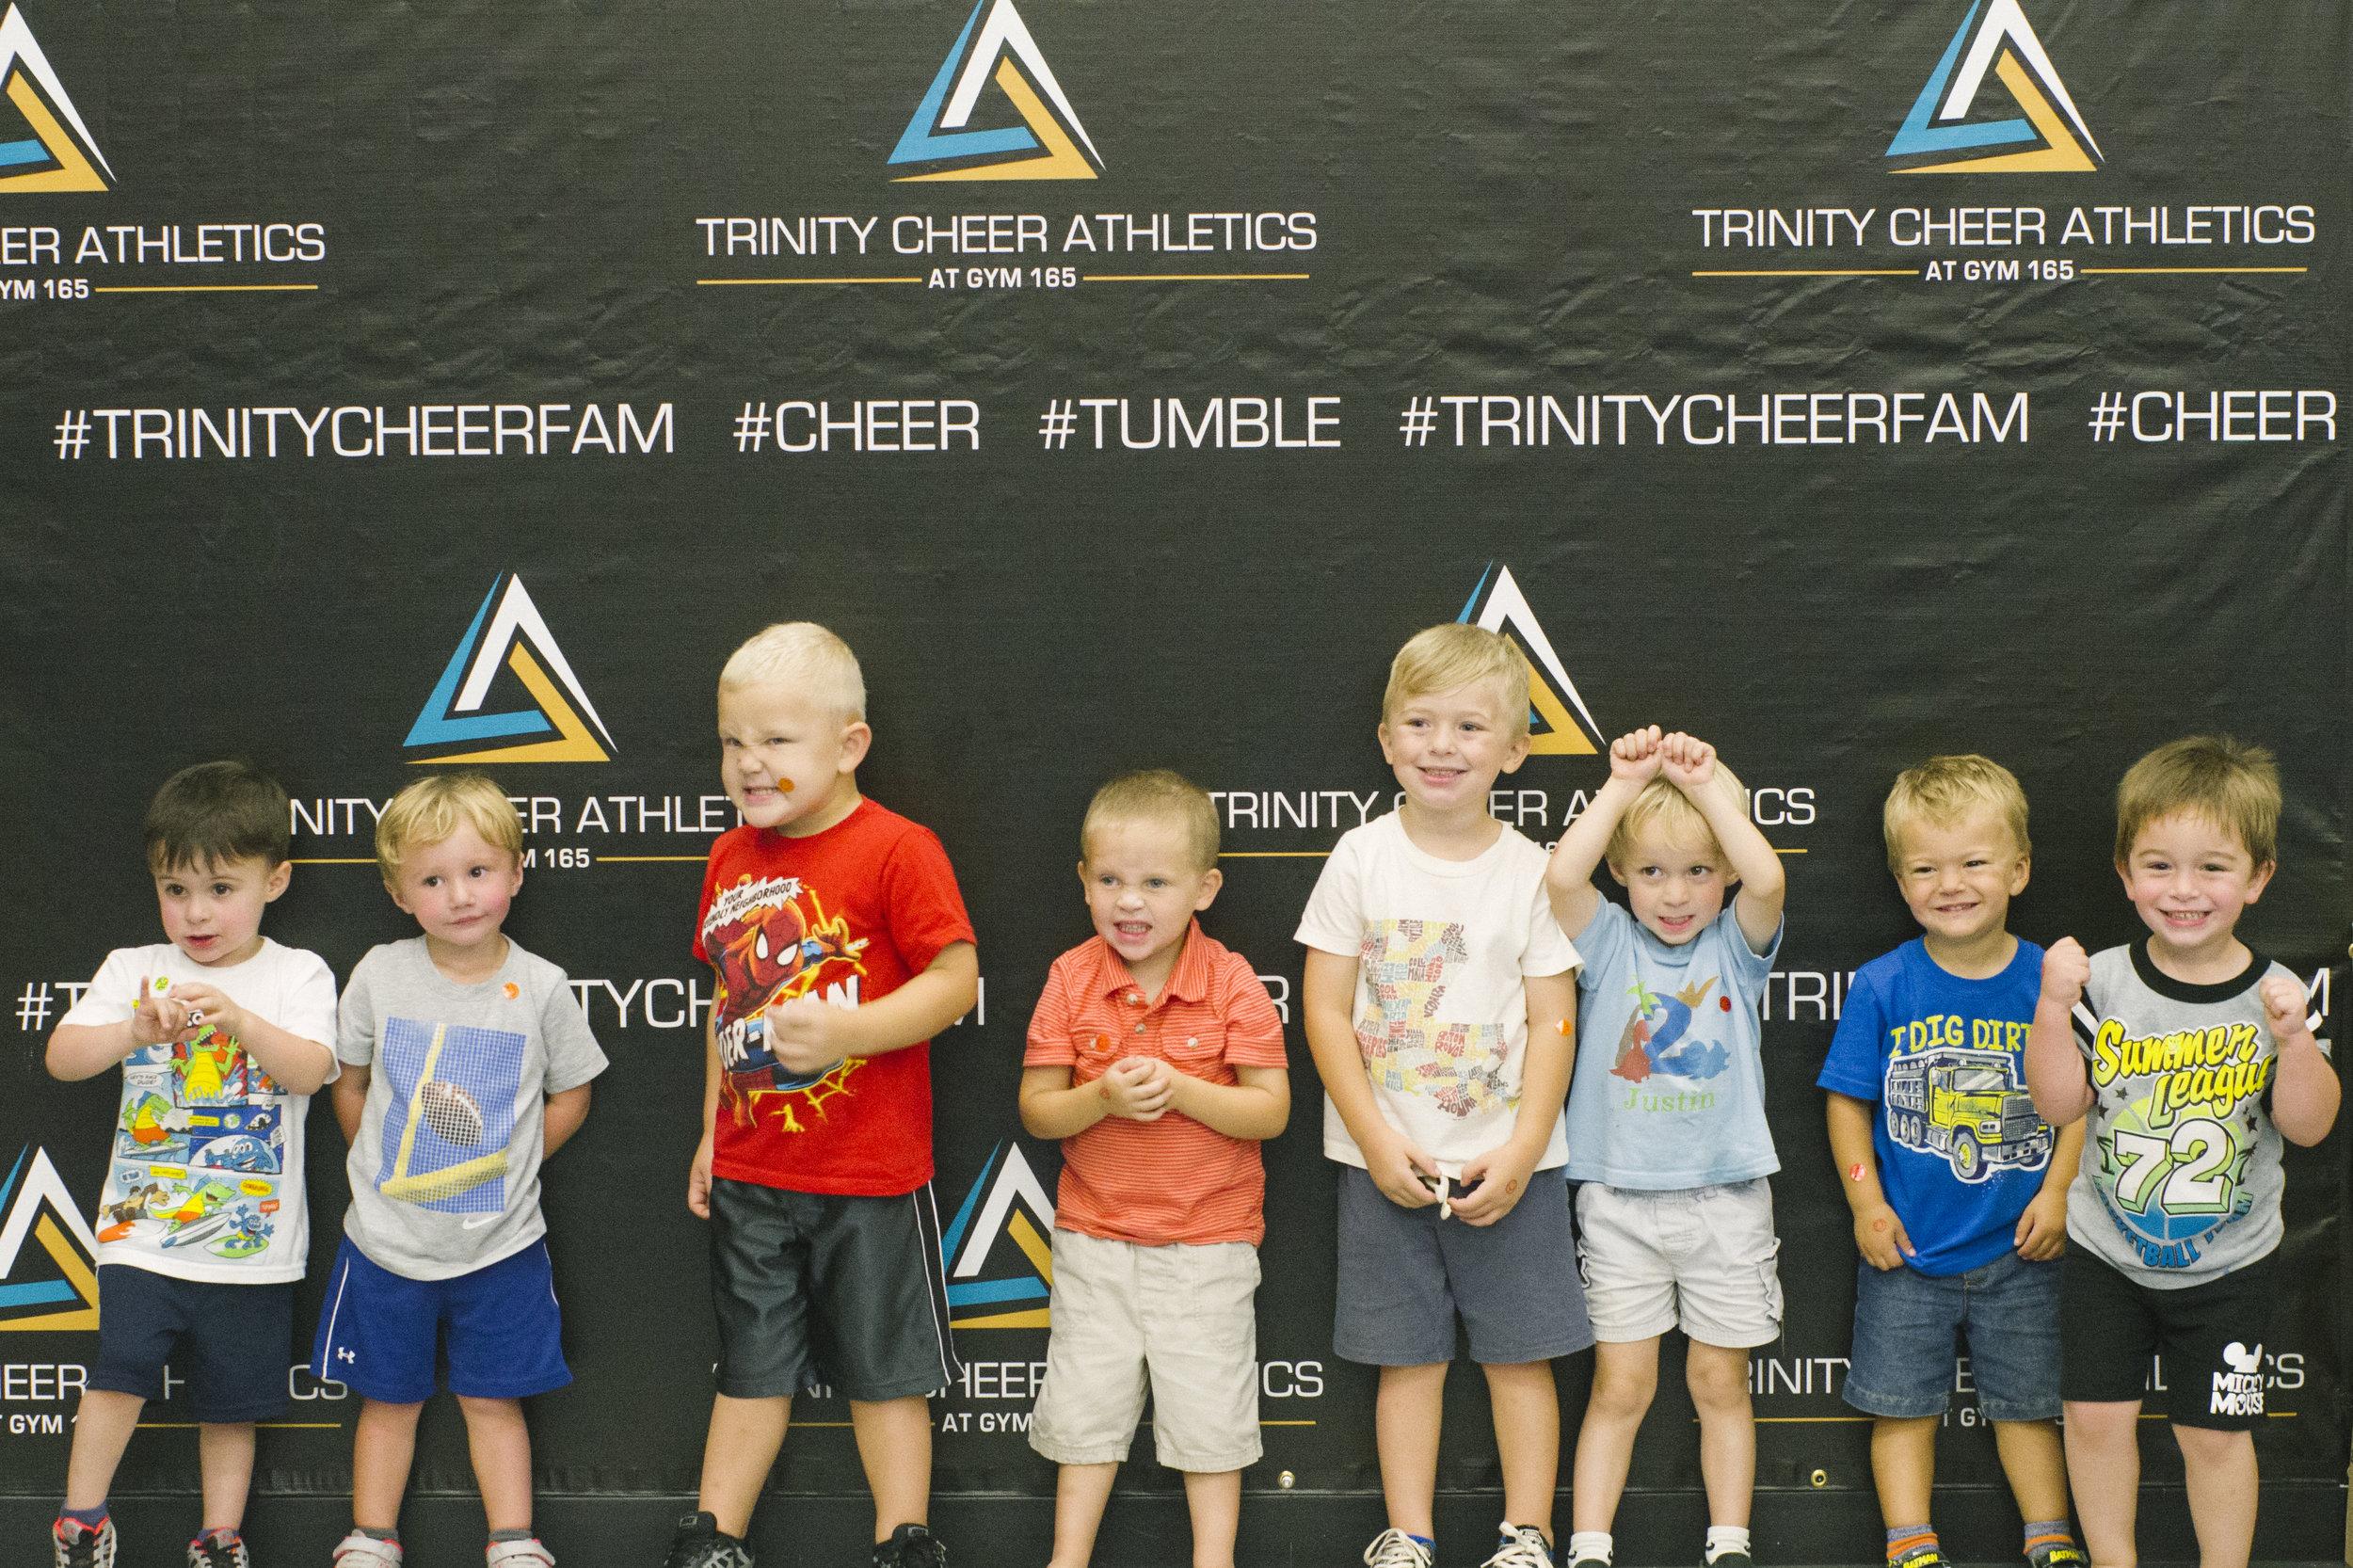 Trinity_Cheer_Athletics_Preschool_067.jpg